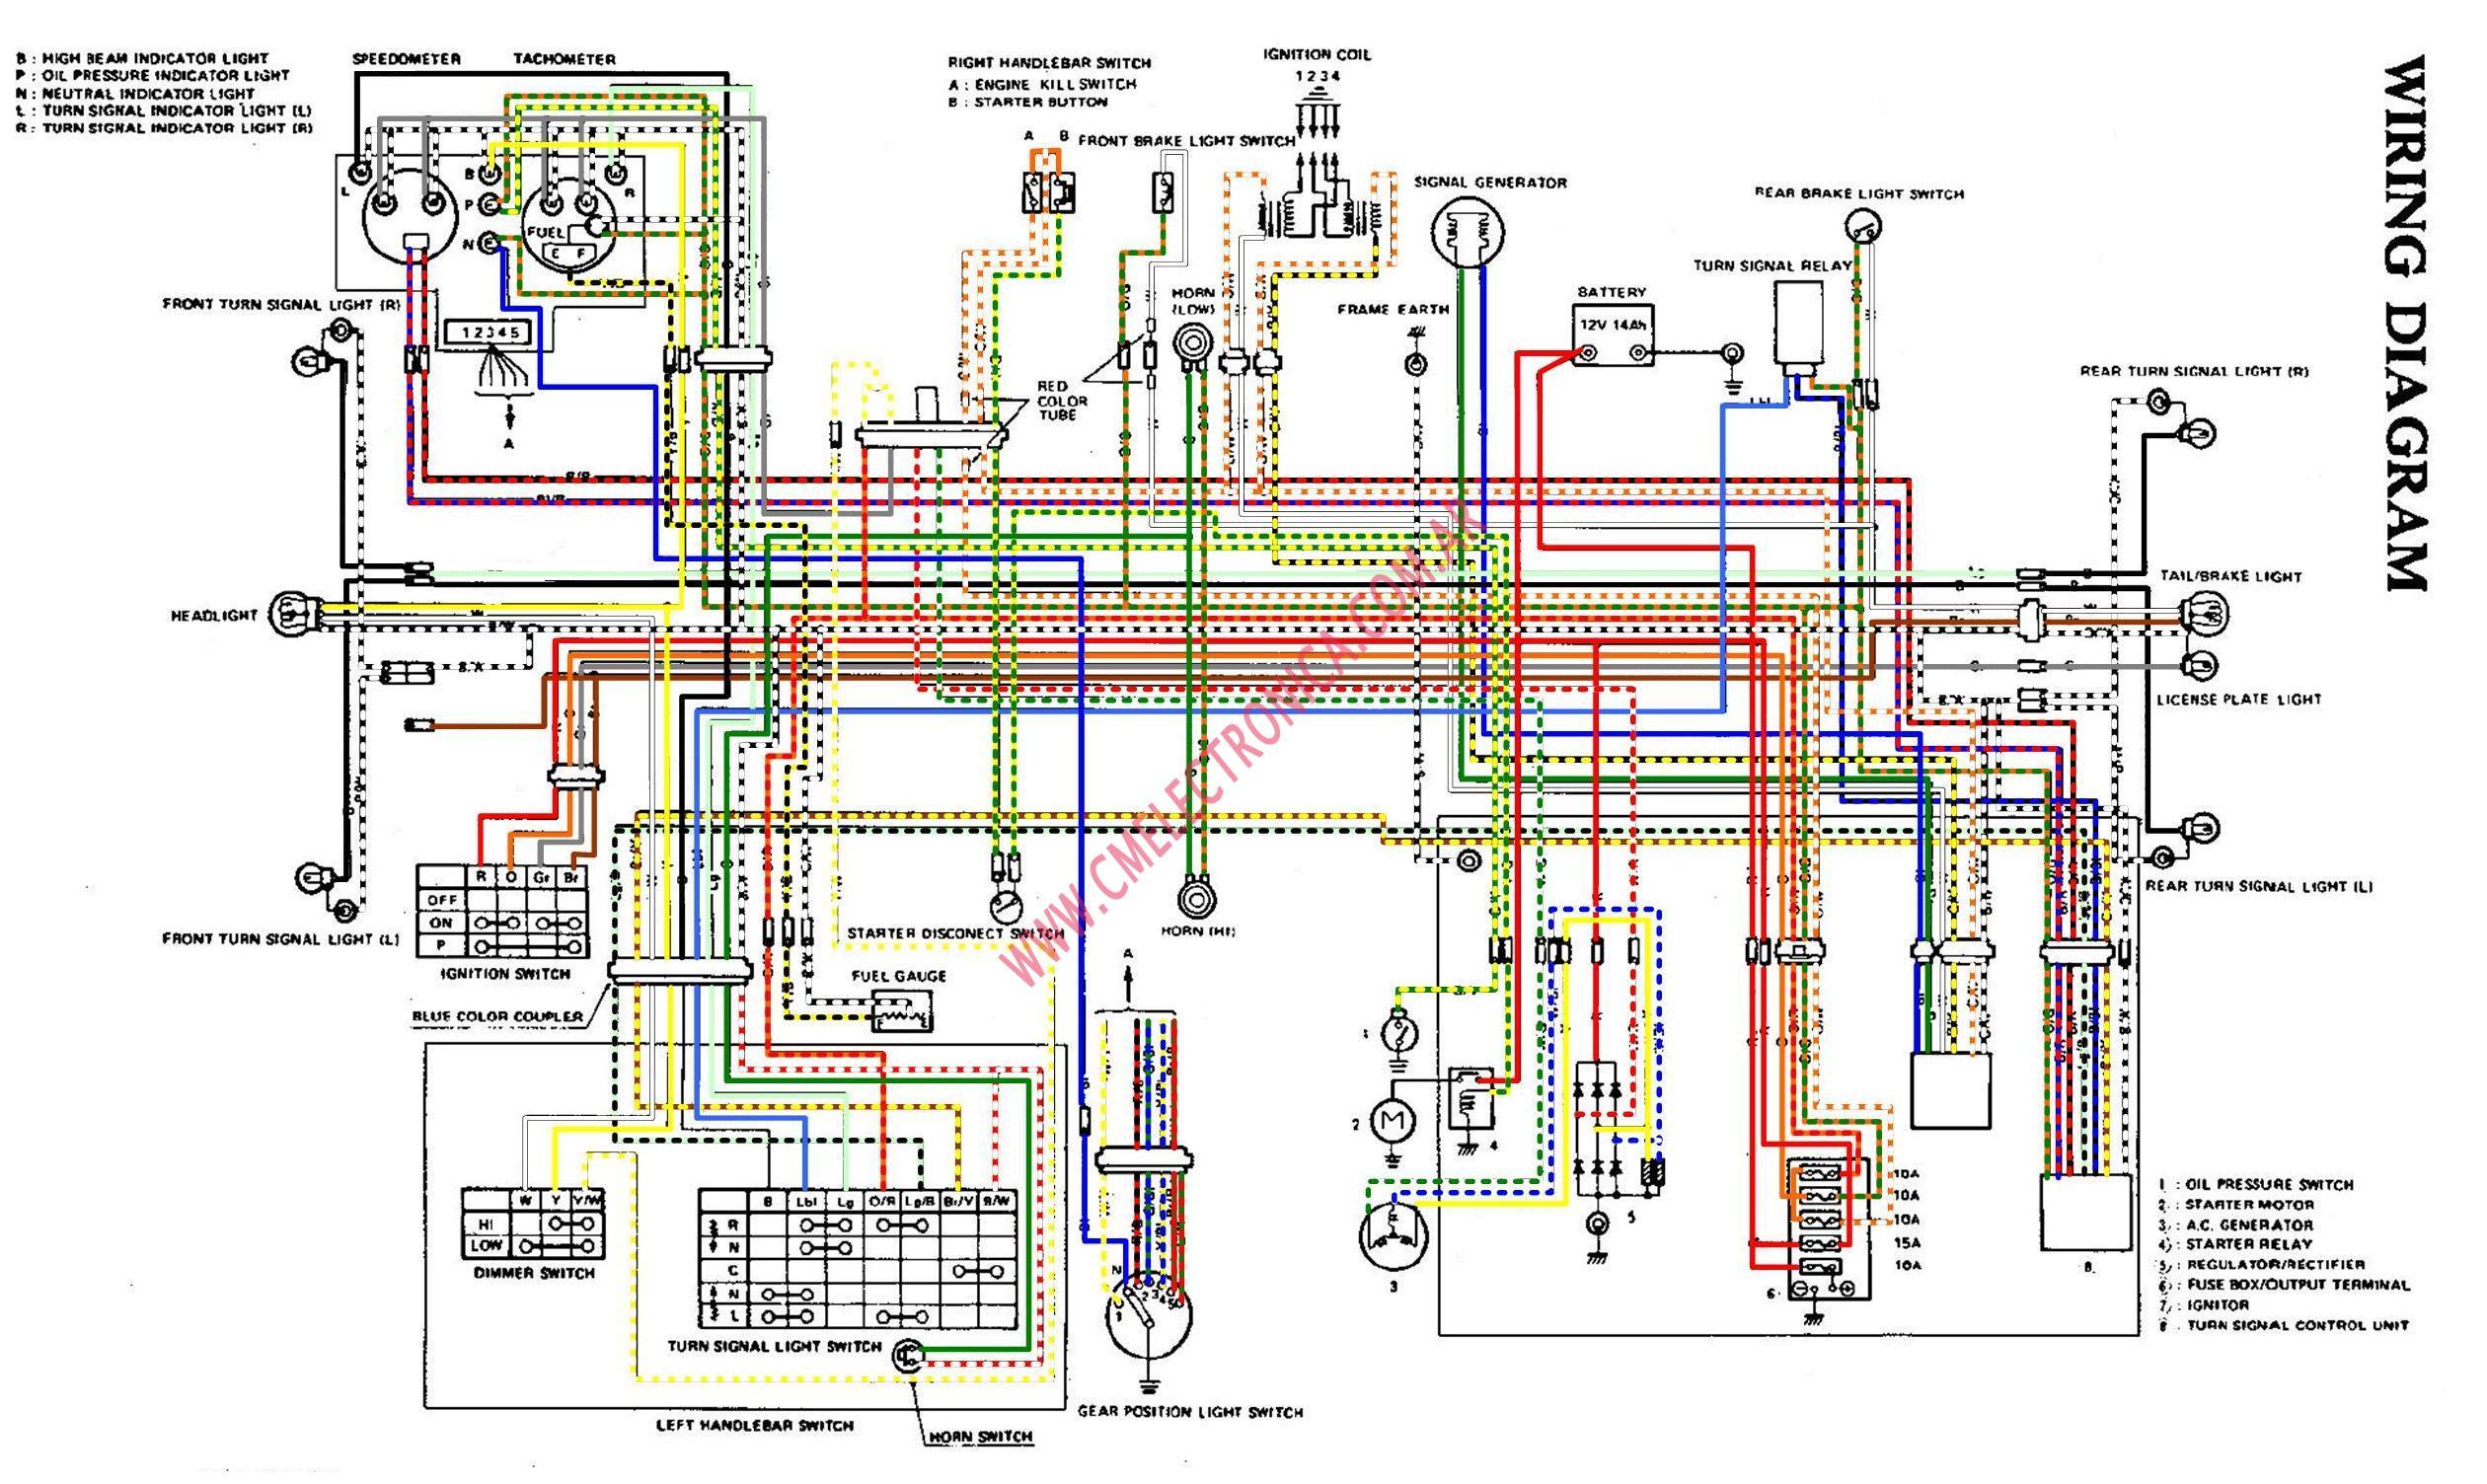 [DIAGRAM_38DE]  SL_7061] Suzuki Gt500 Wiring Diagram Free Diagram   T586b Wiring Diagram      Viewor Pimpaps Teria Xaem Ical Licuk Carn Rious Sand Lukep Oxyt Rmine Shopa  Mohammedshrine Librar Wiring 101